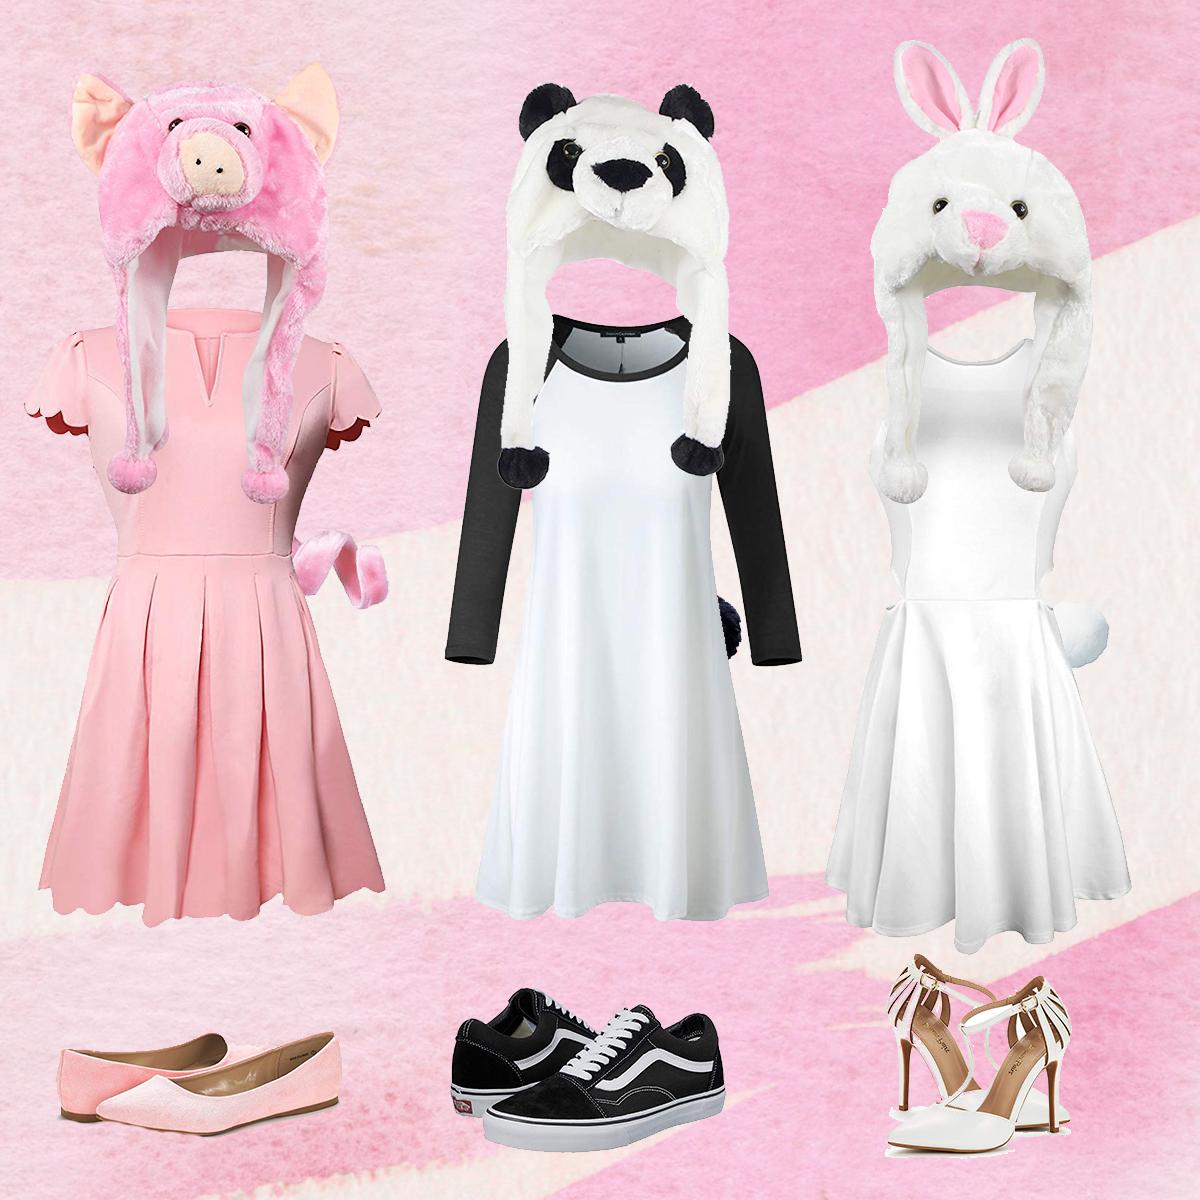 ladyfolk-studio-halloween-costumes.jpg